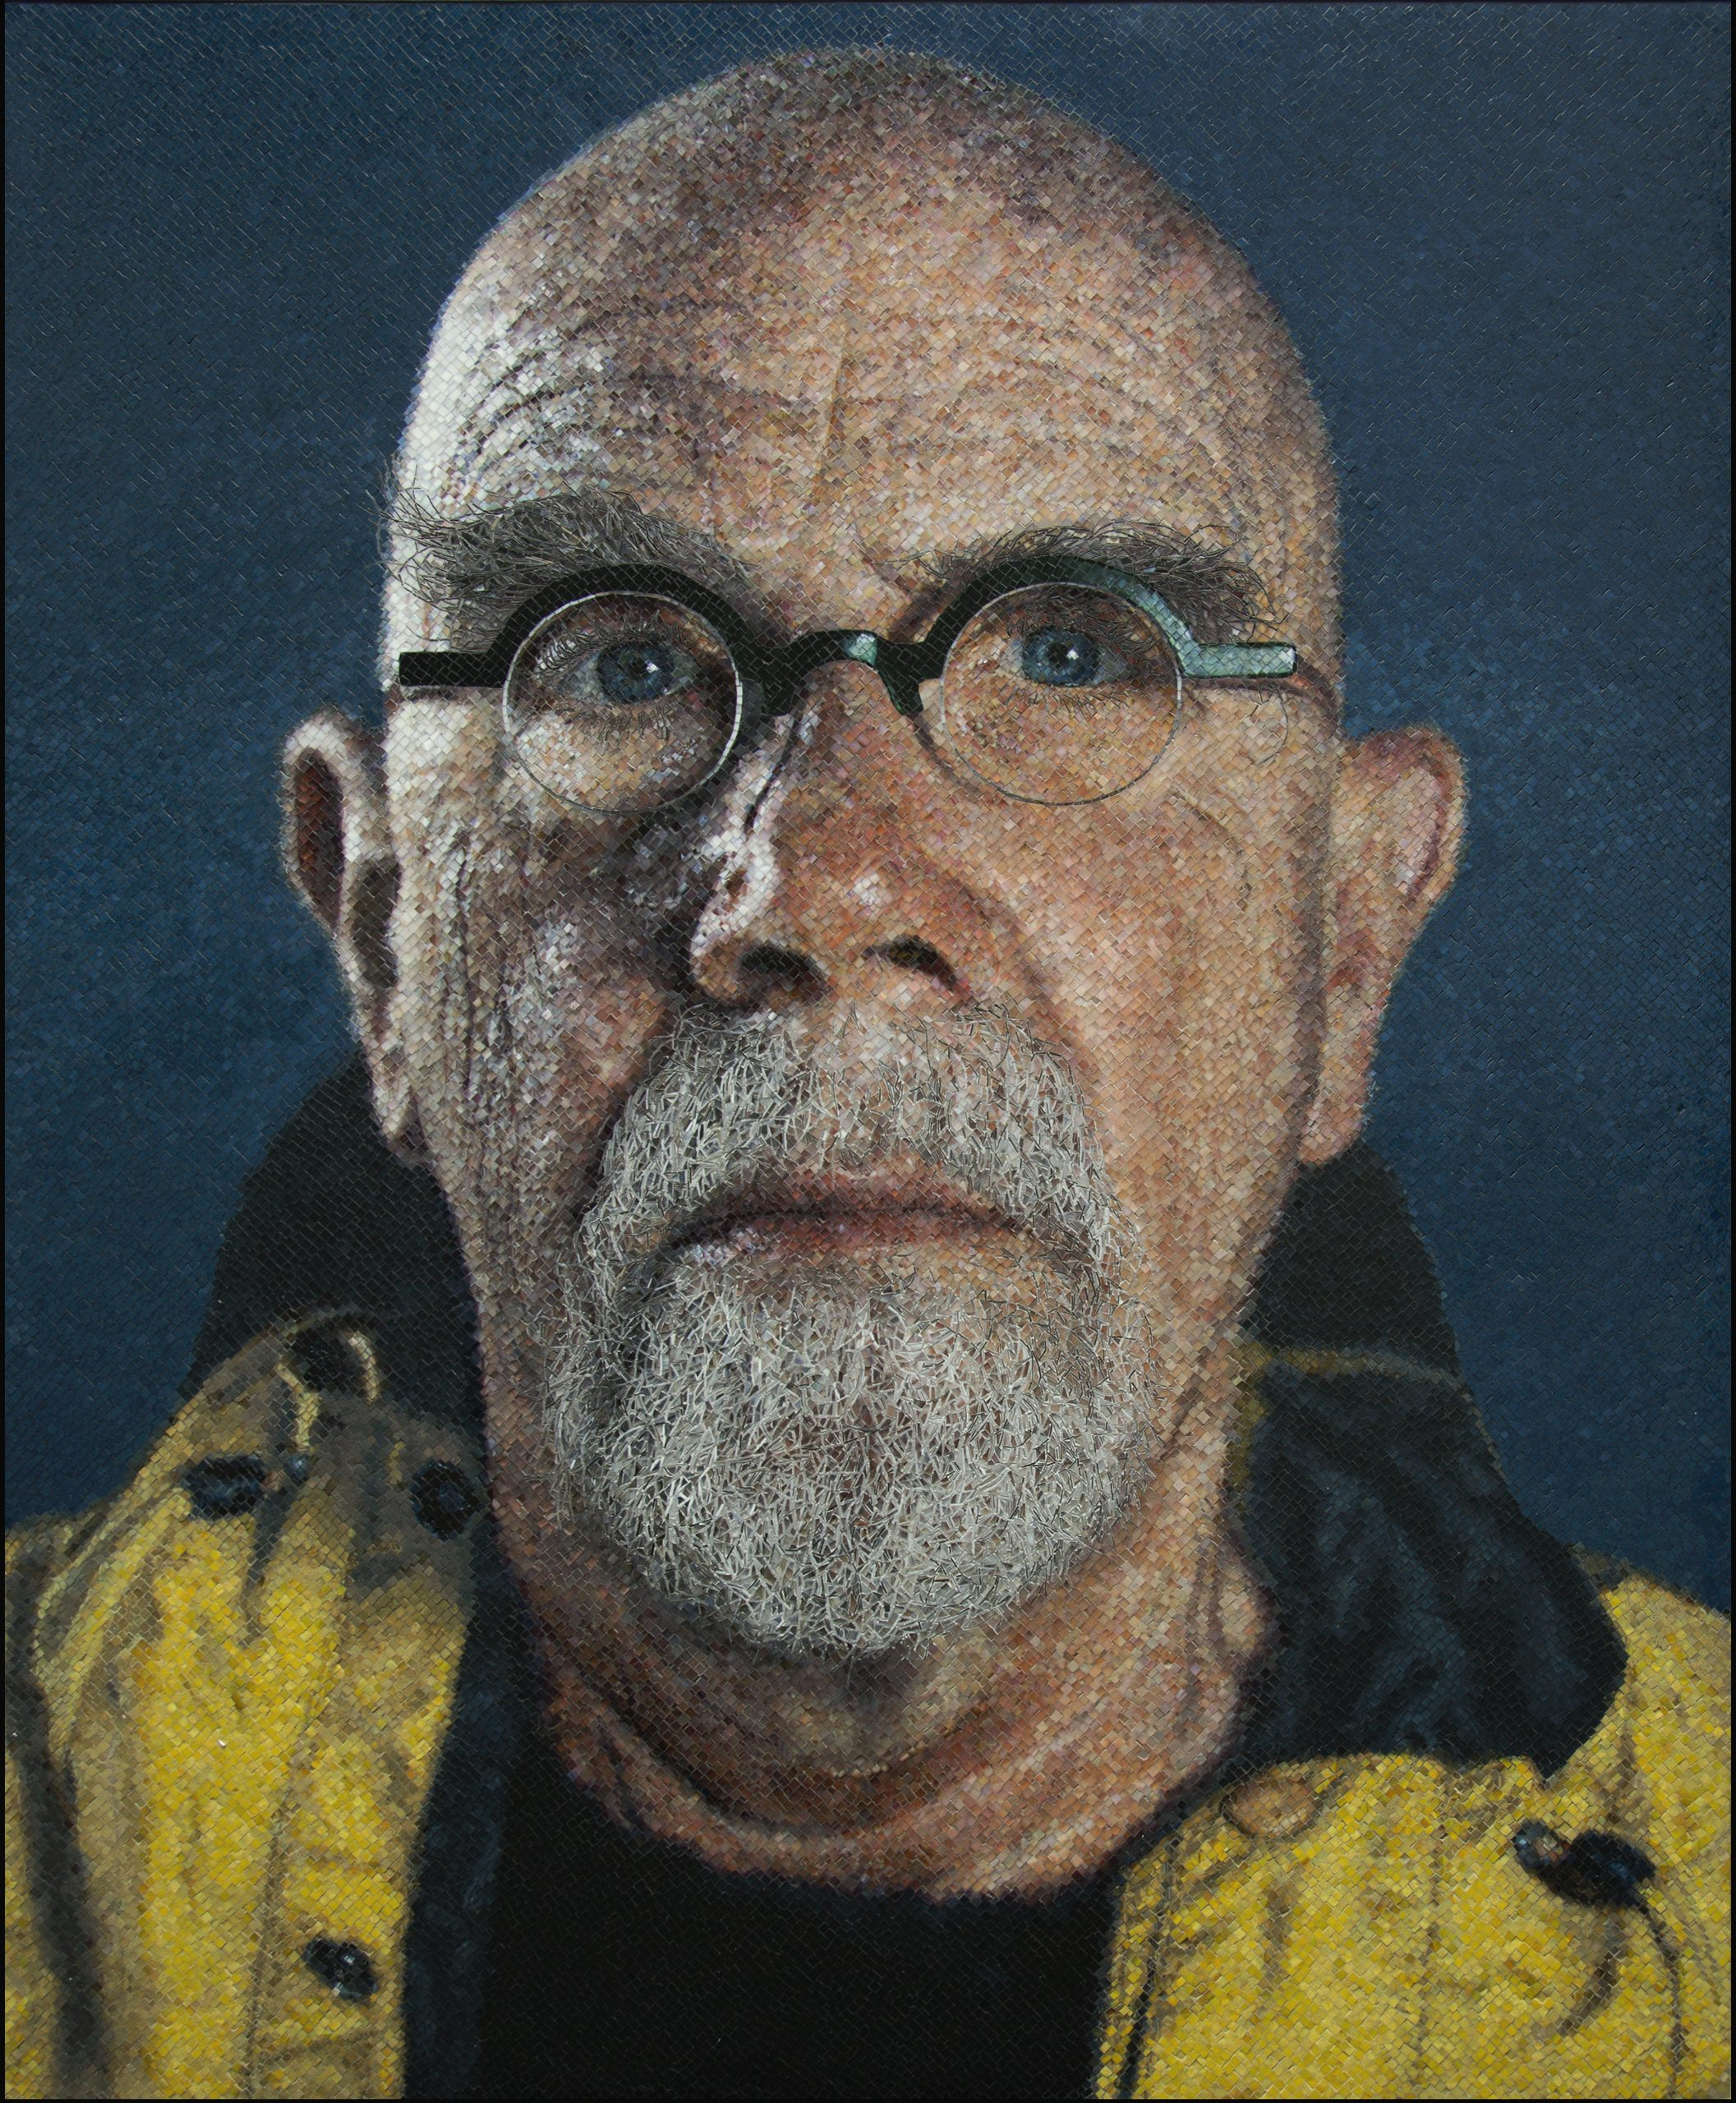 Chuck Close MAR Ravenna Yellow Raincoat_FULL